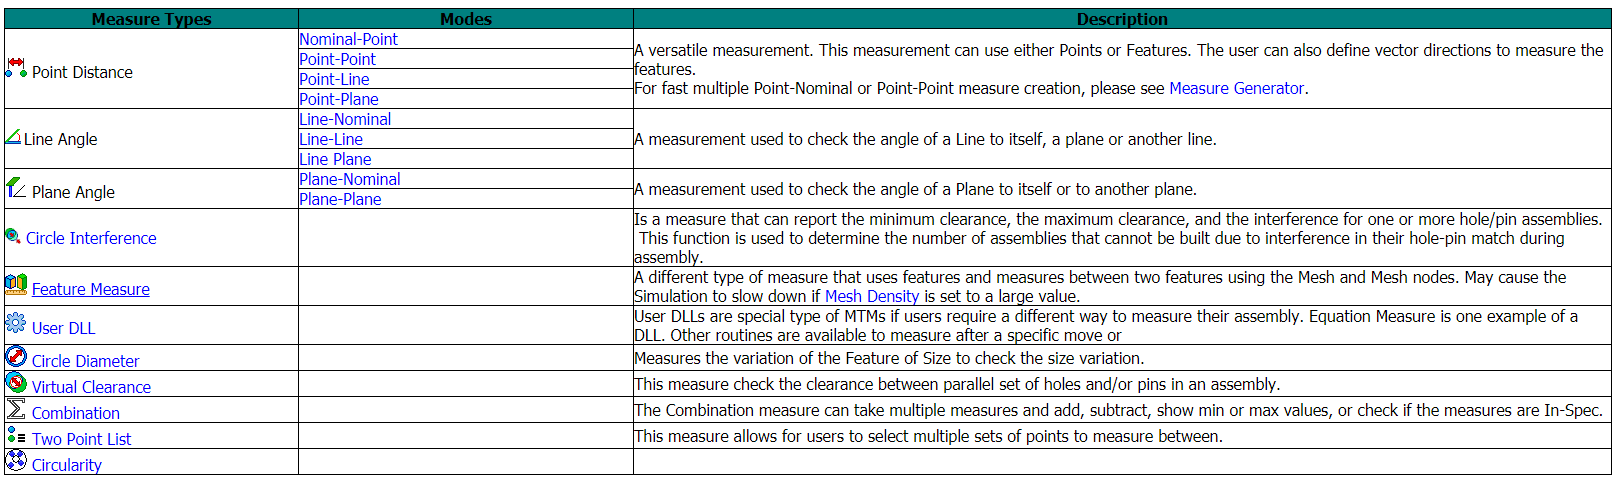 3DCS Measurements for Tolerance Analysis